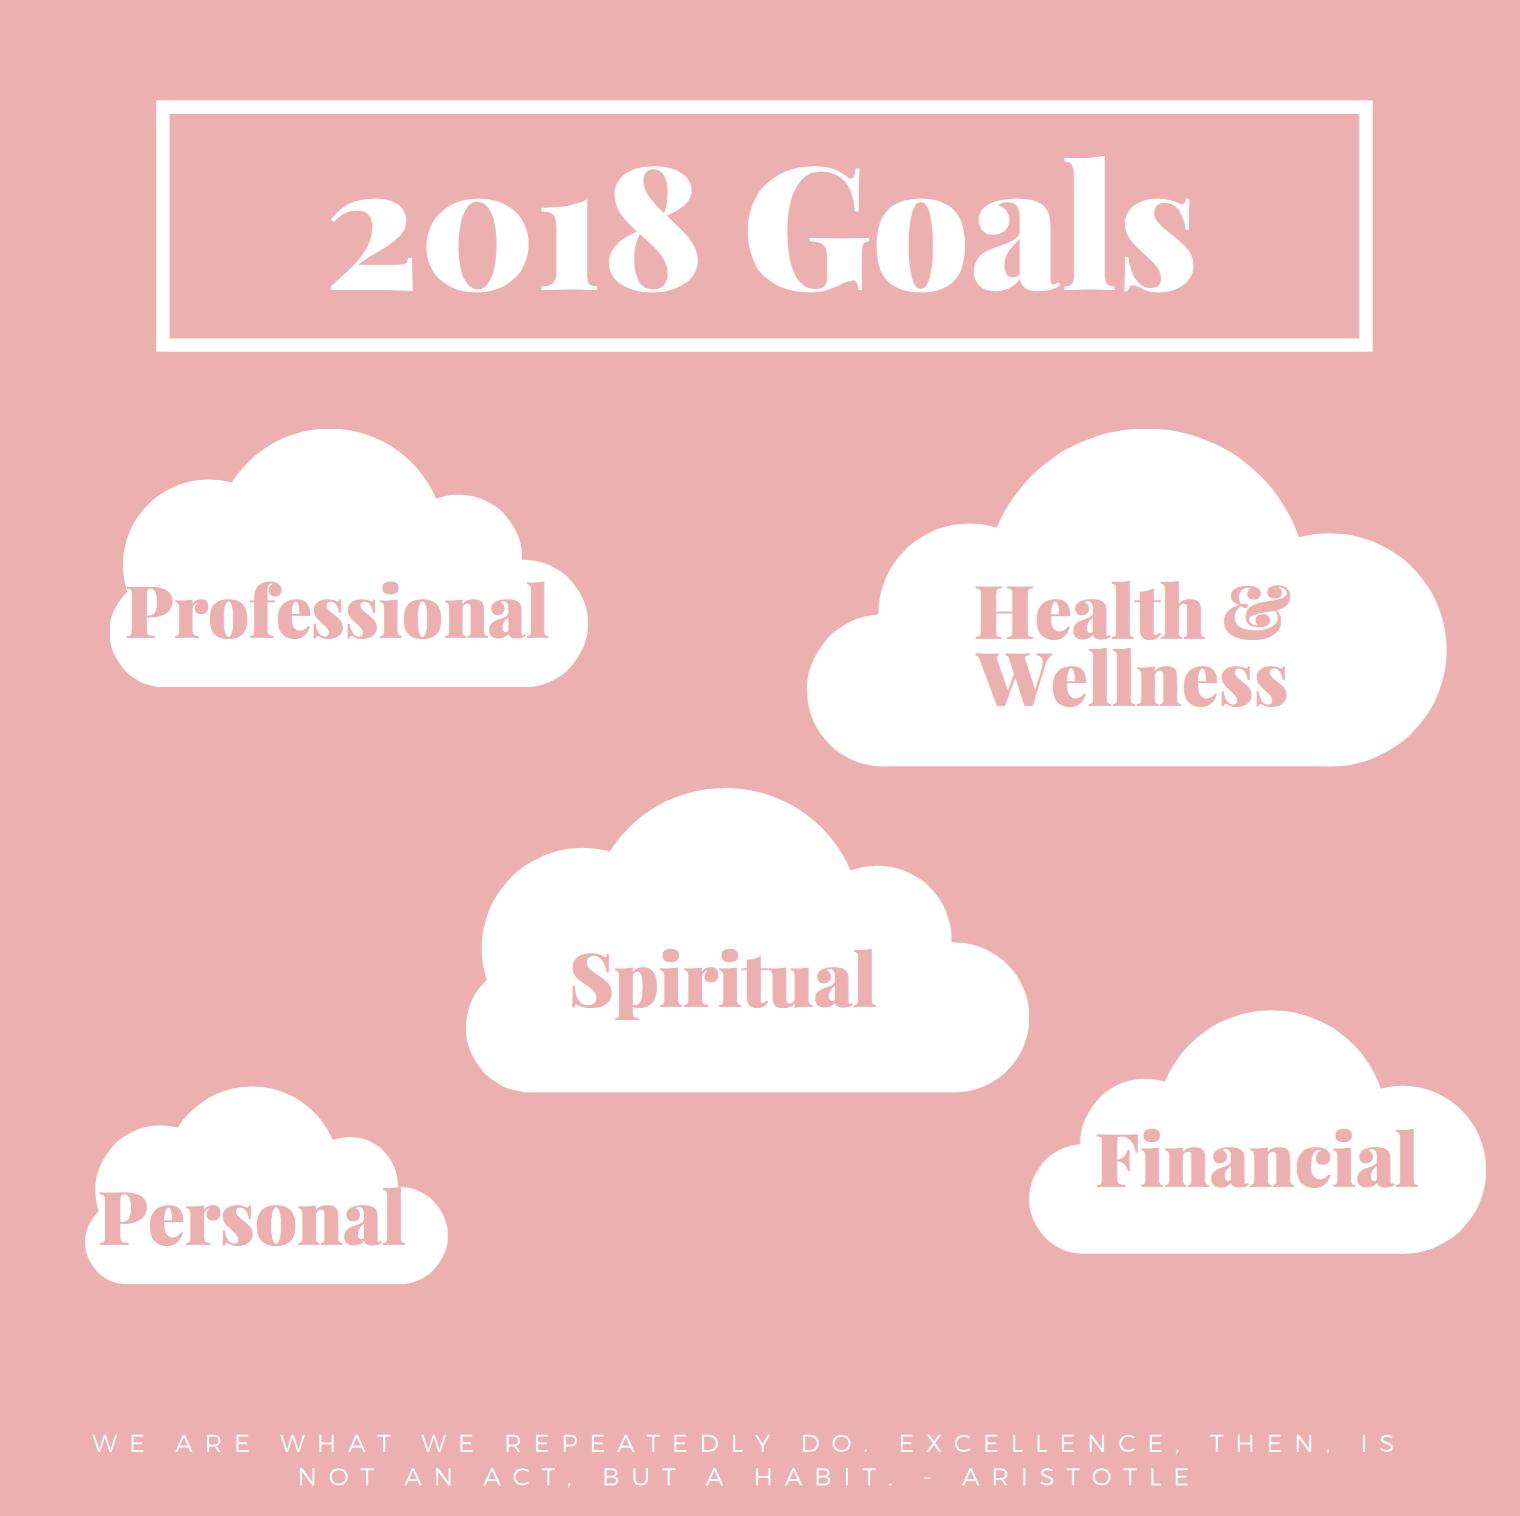 6 Steps to Set Goals and Smash Them